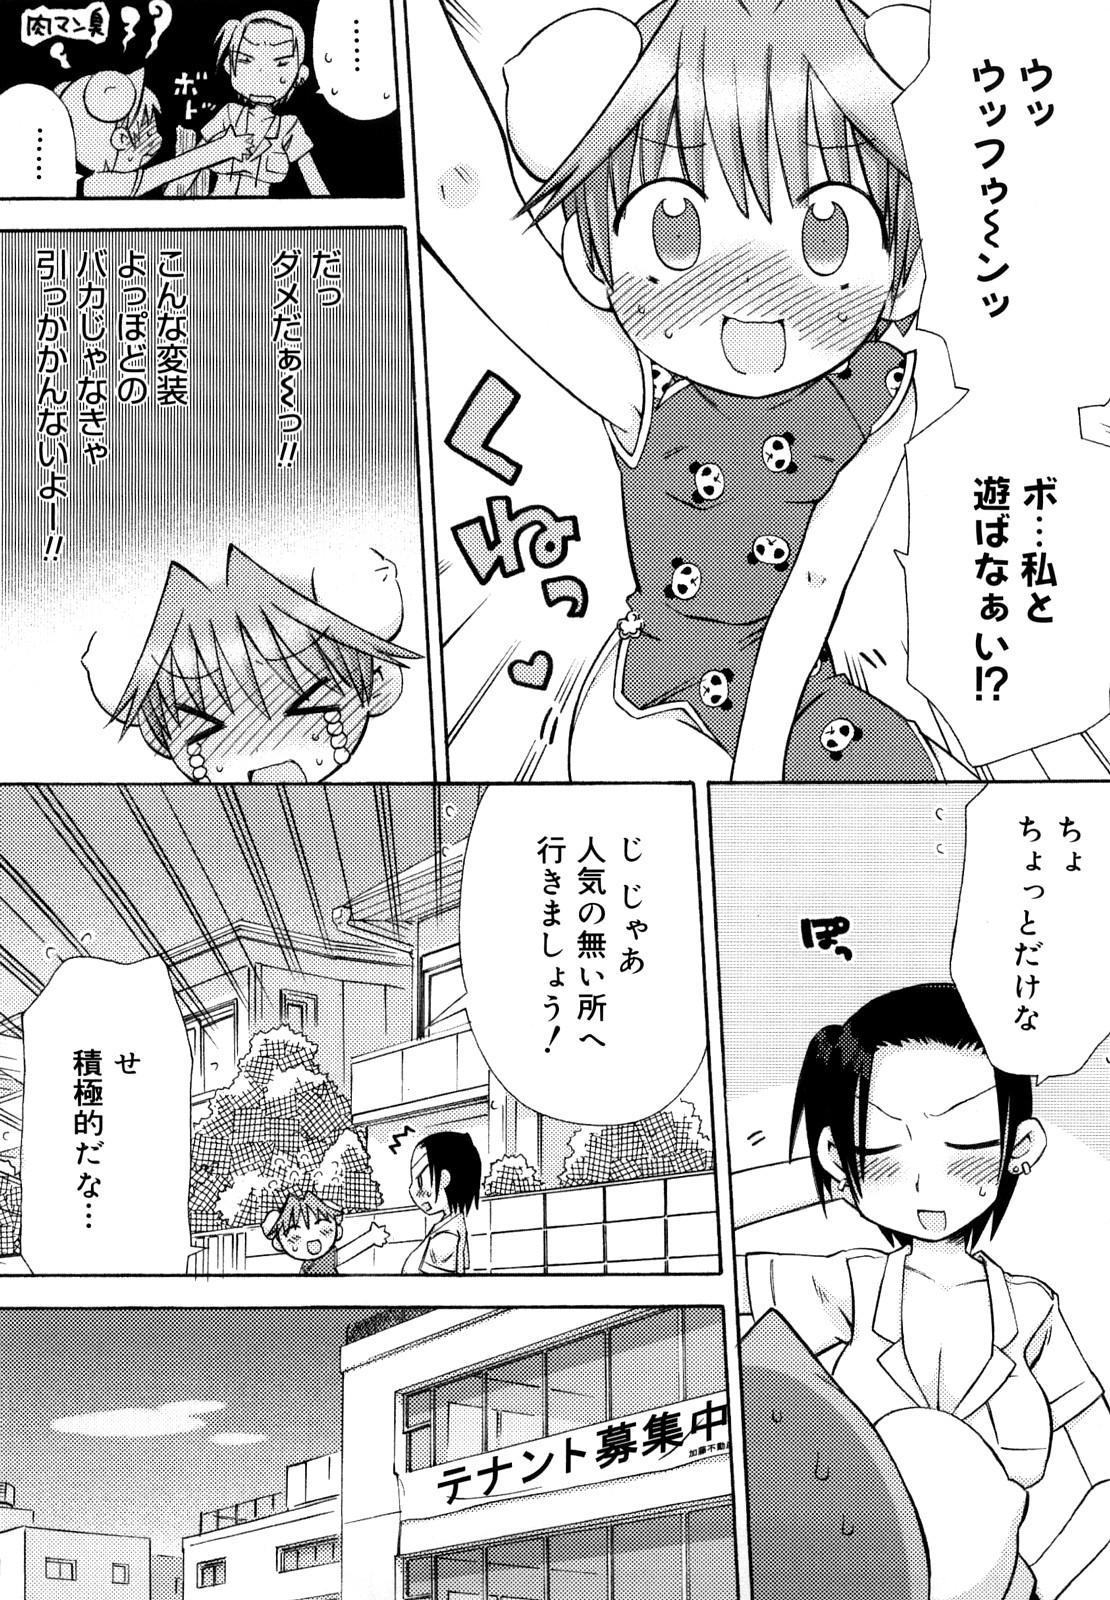 Hatsuden Pandakun! Shinsouban 81